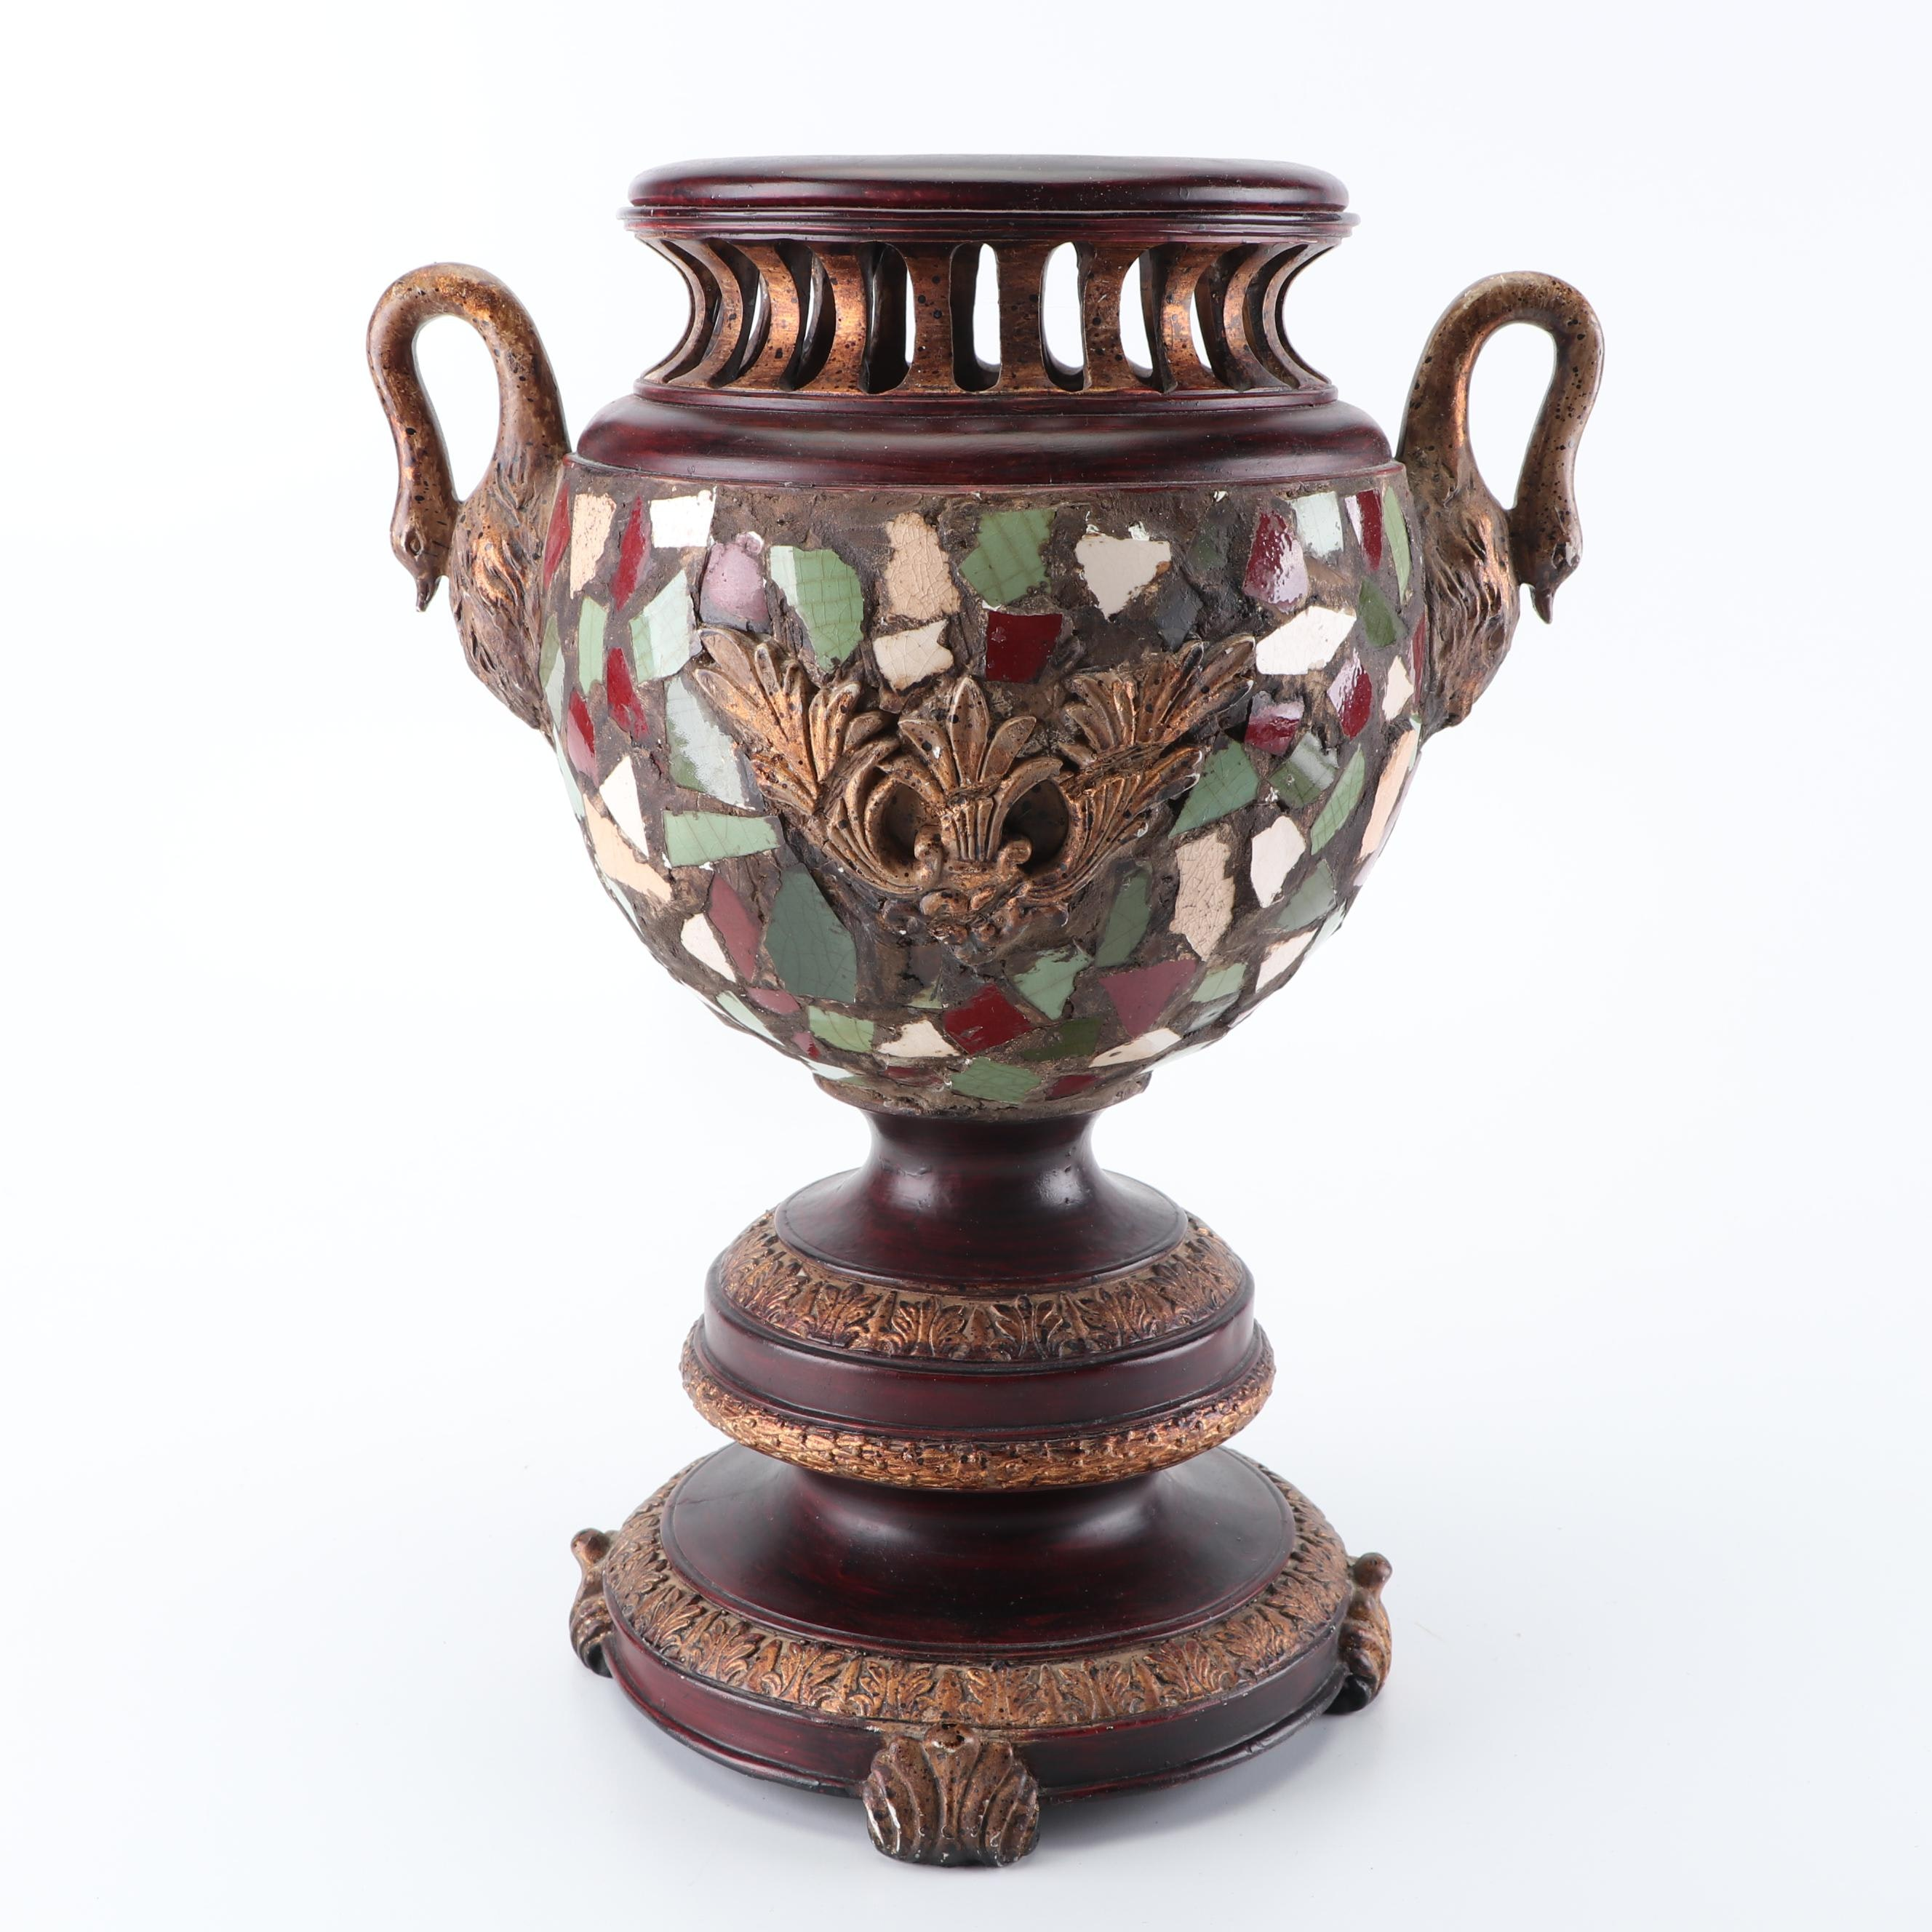 Mosaic Urn with Figural Swan Handles